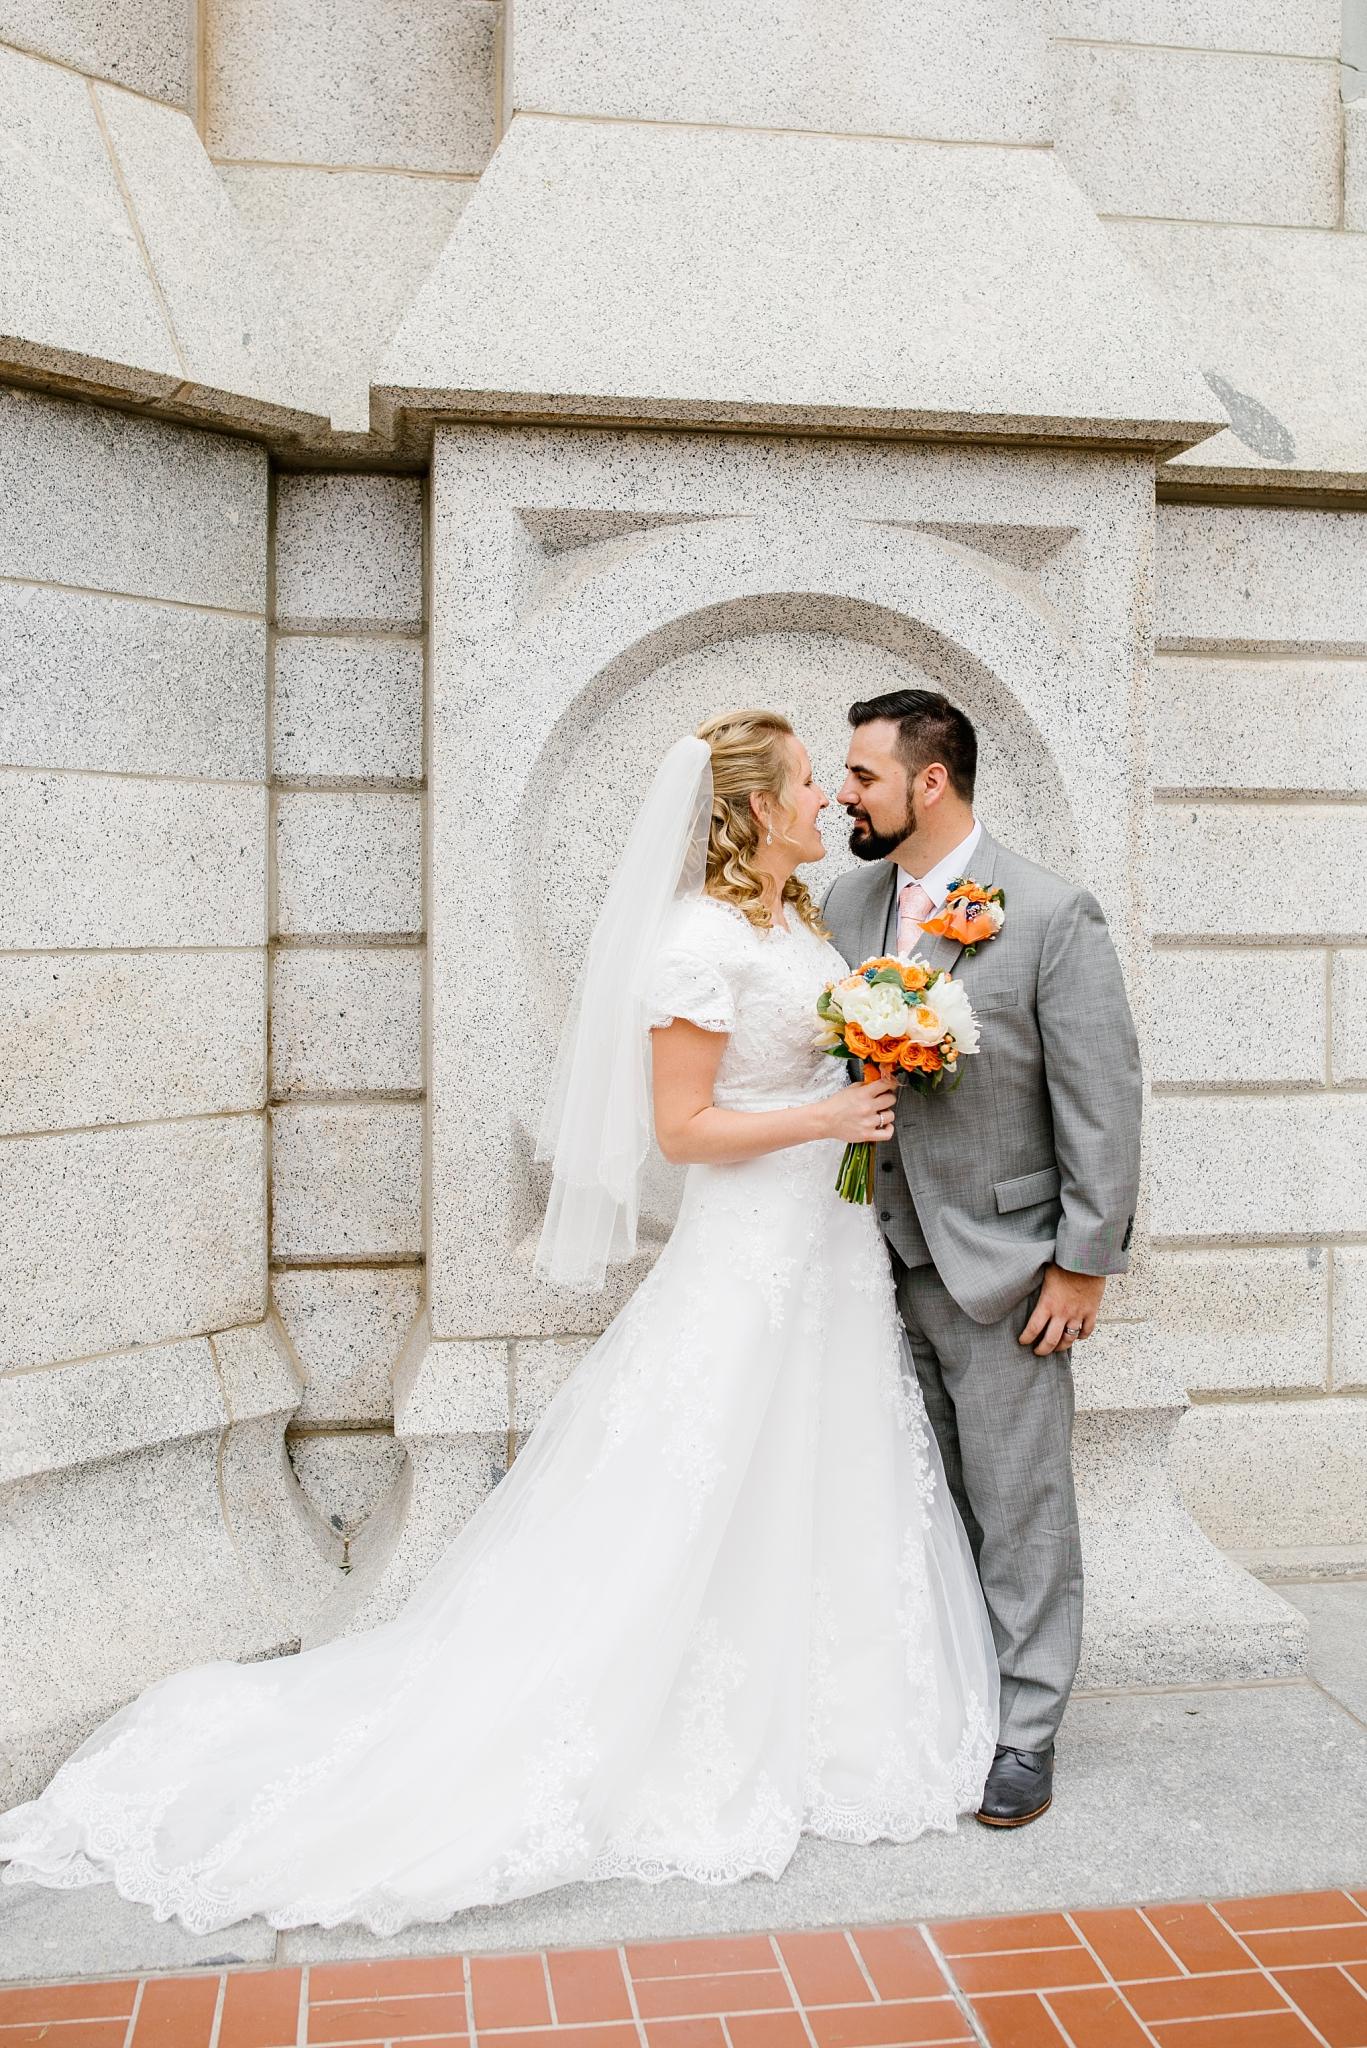 Justin and Melissa-116_Lizzie-B-Imagery-Utah-Wedding-Photographer-Salt-Lake-City-Temple-Photographer-Lion-House-Luncheon-The-Grand-Ballroom-Bountiful.jpg